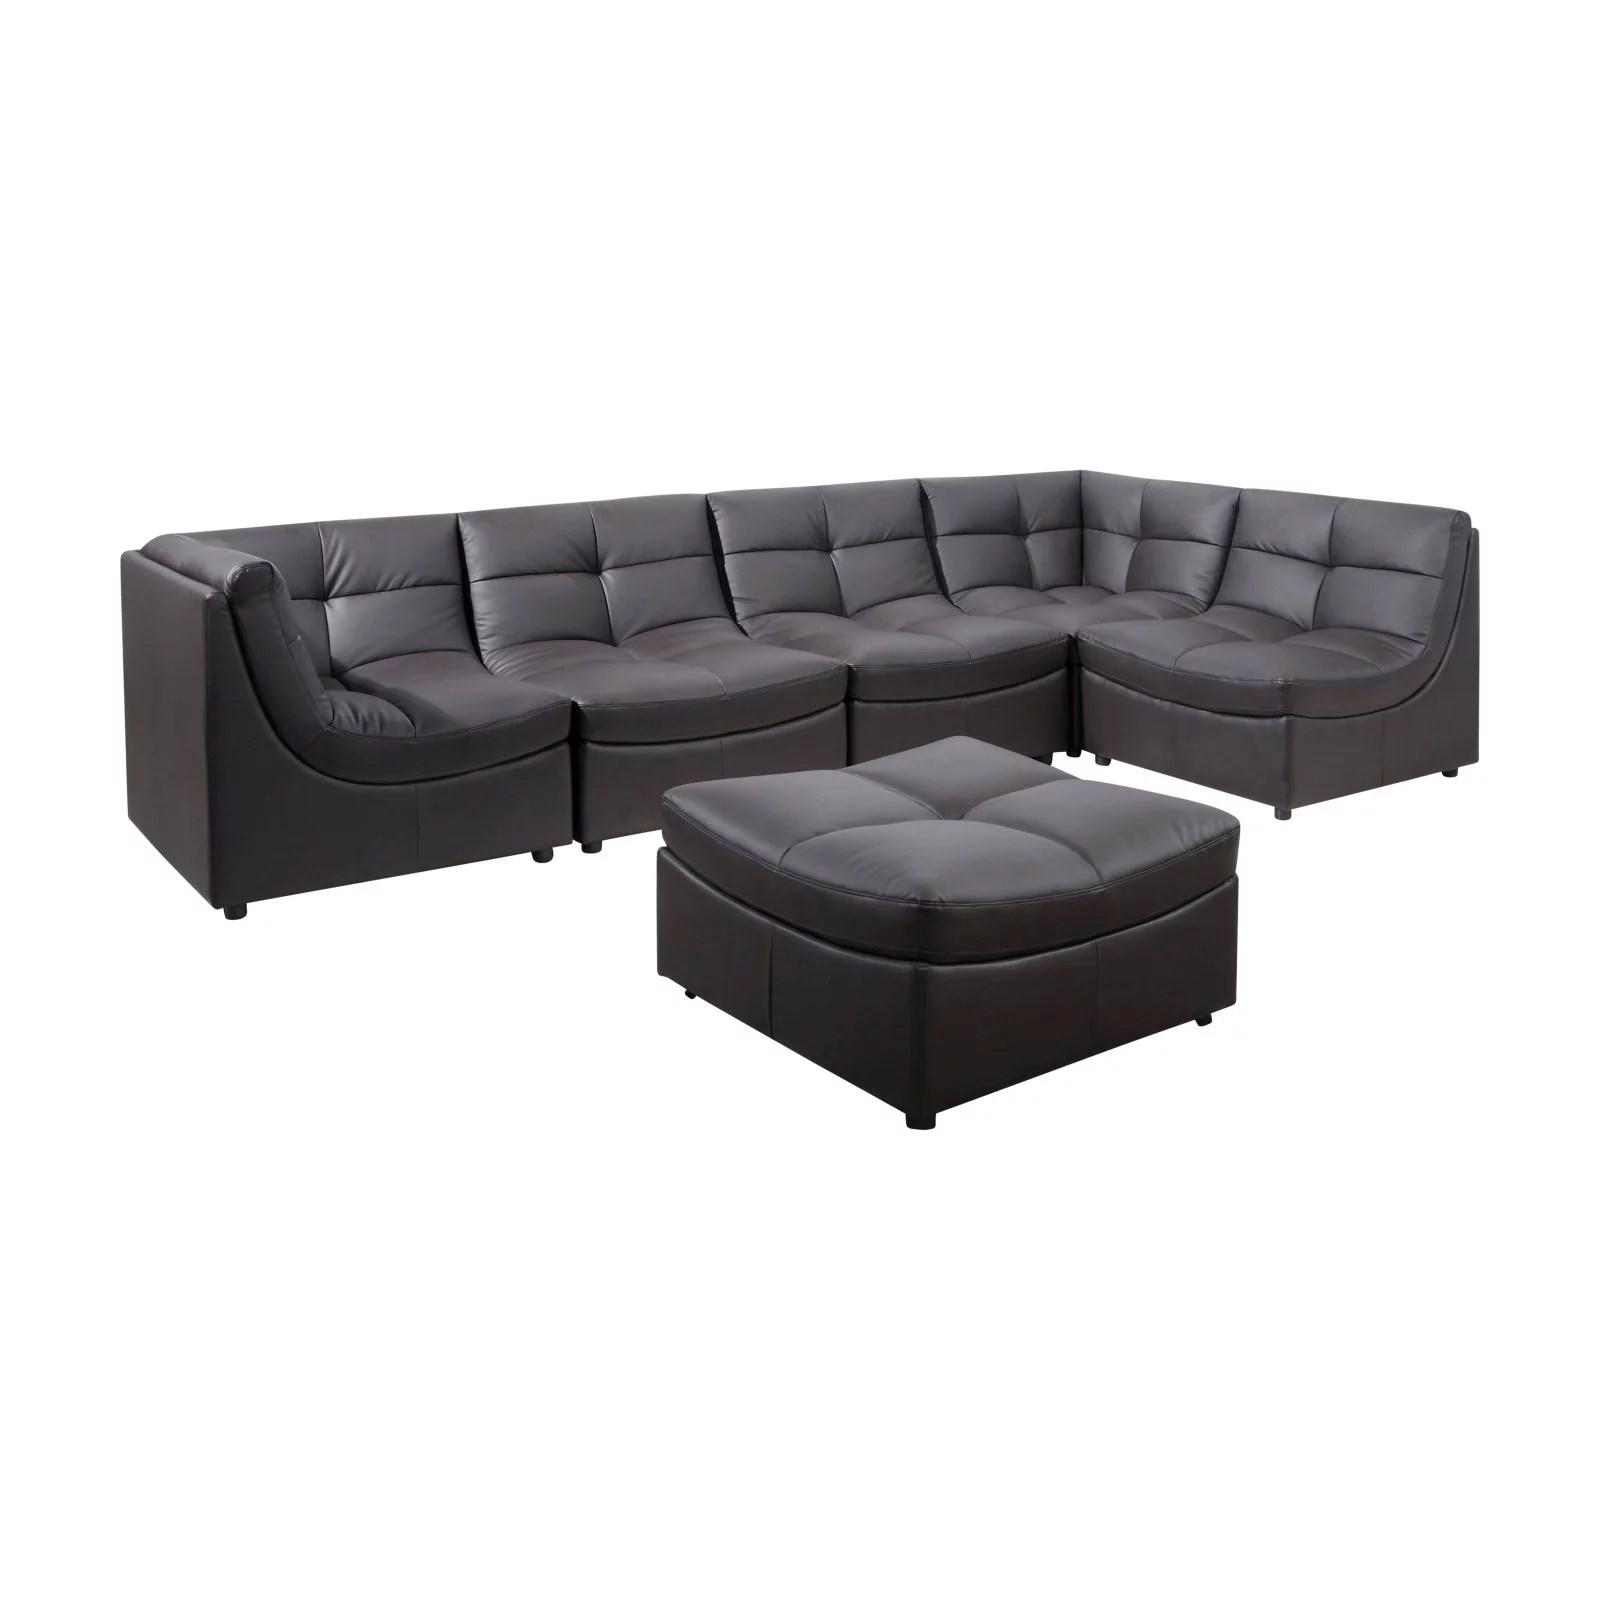 6 piece modular sectional sofa chenille fabric with queen sleeper best master furniture cloud walmart com